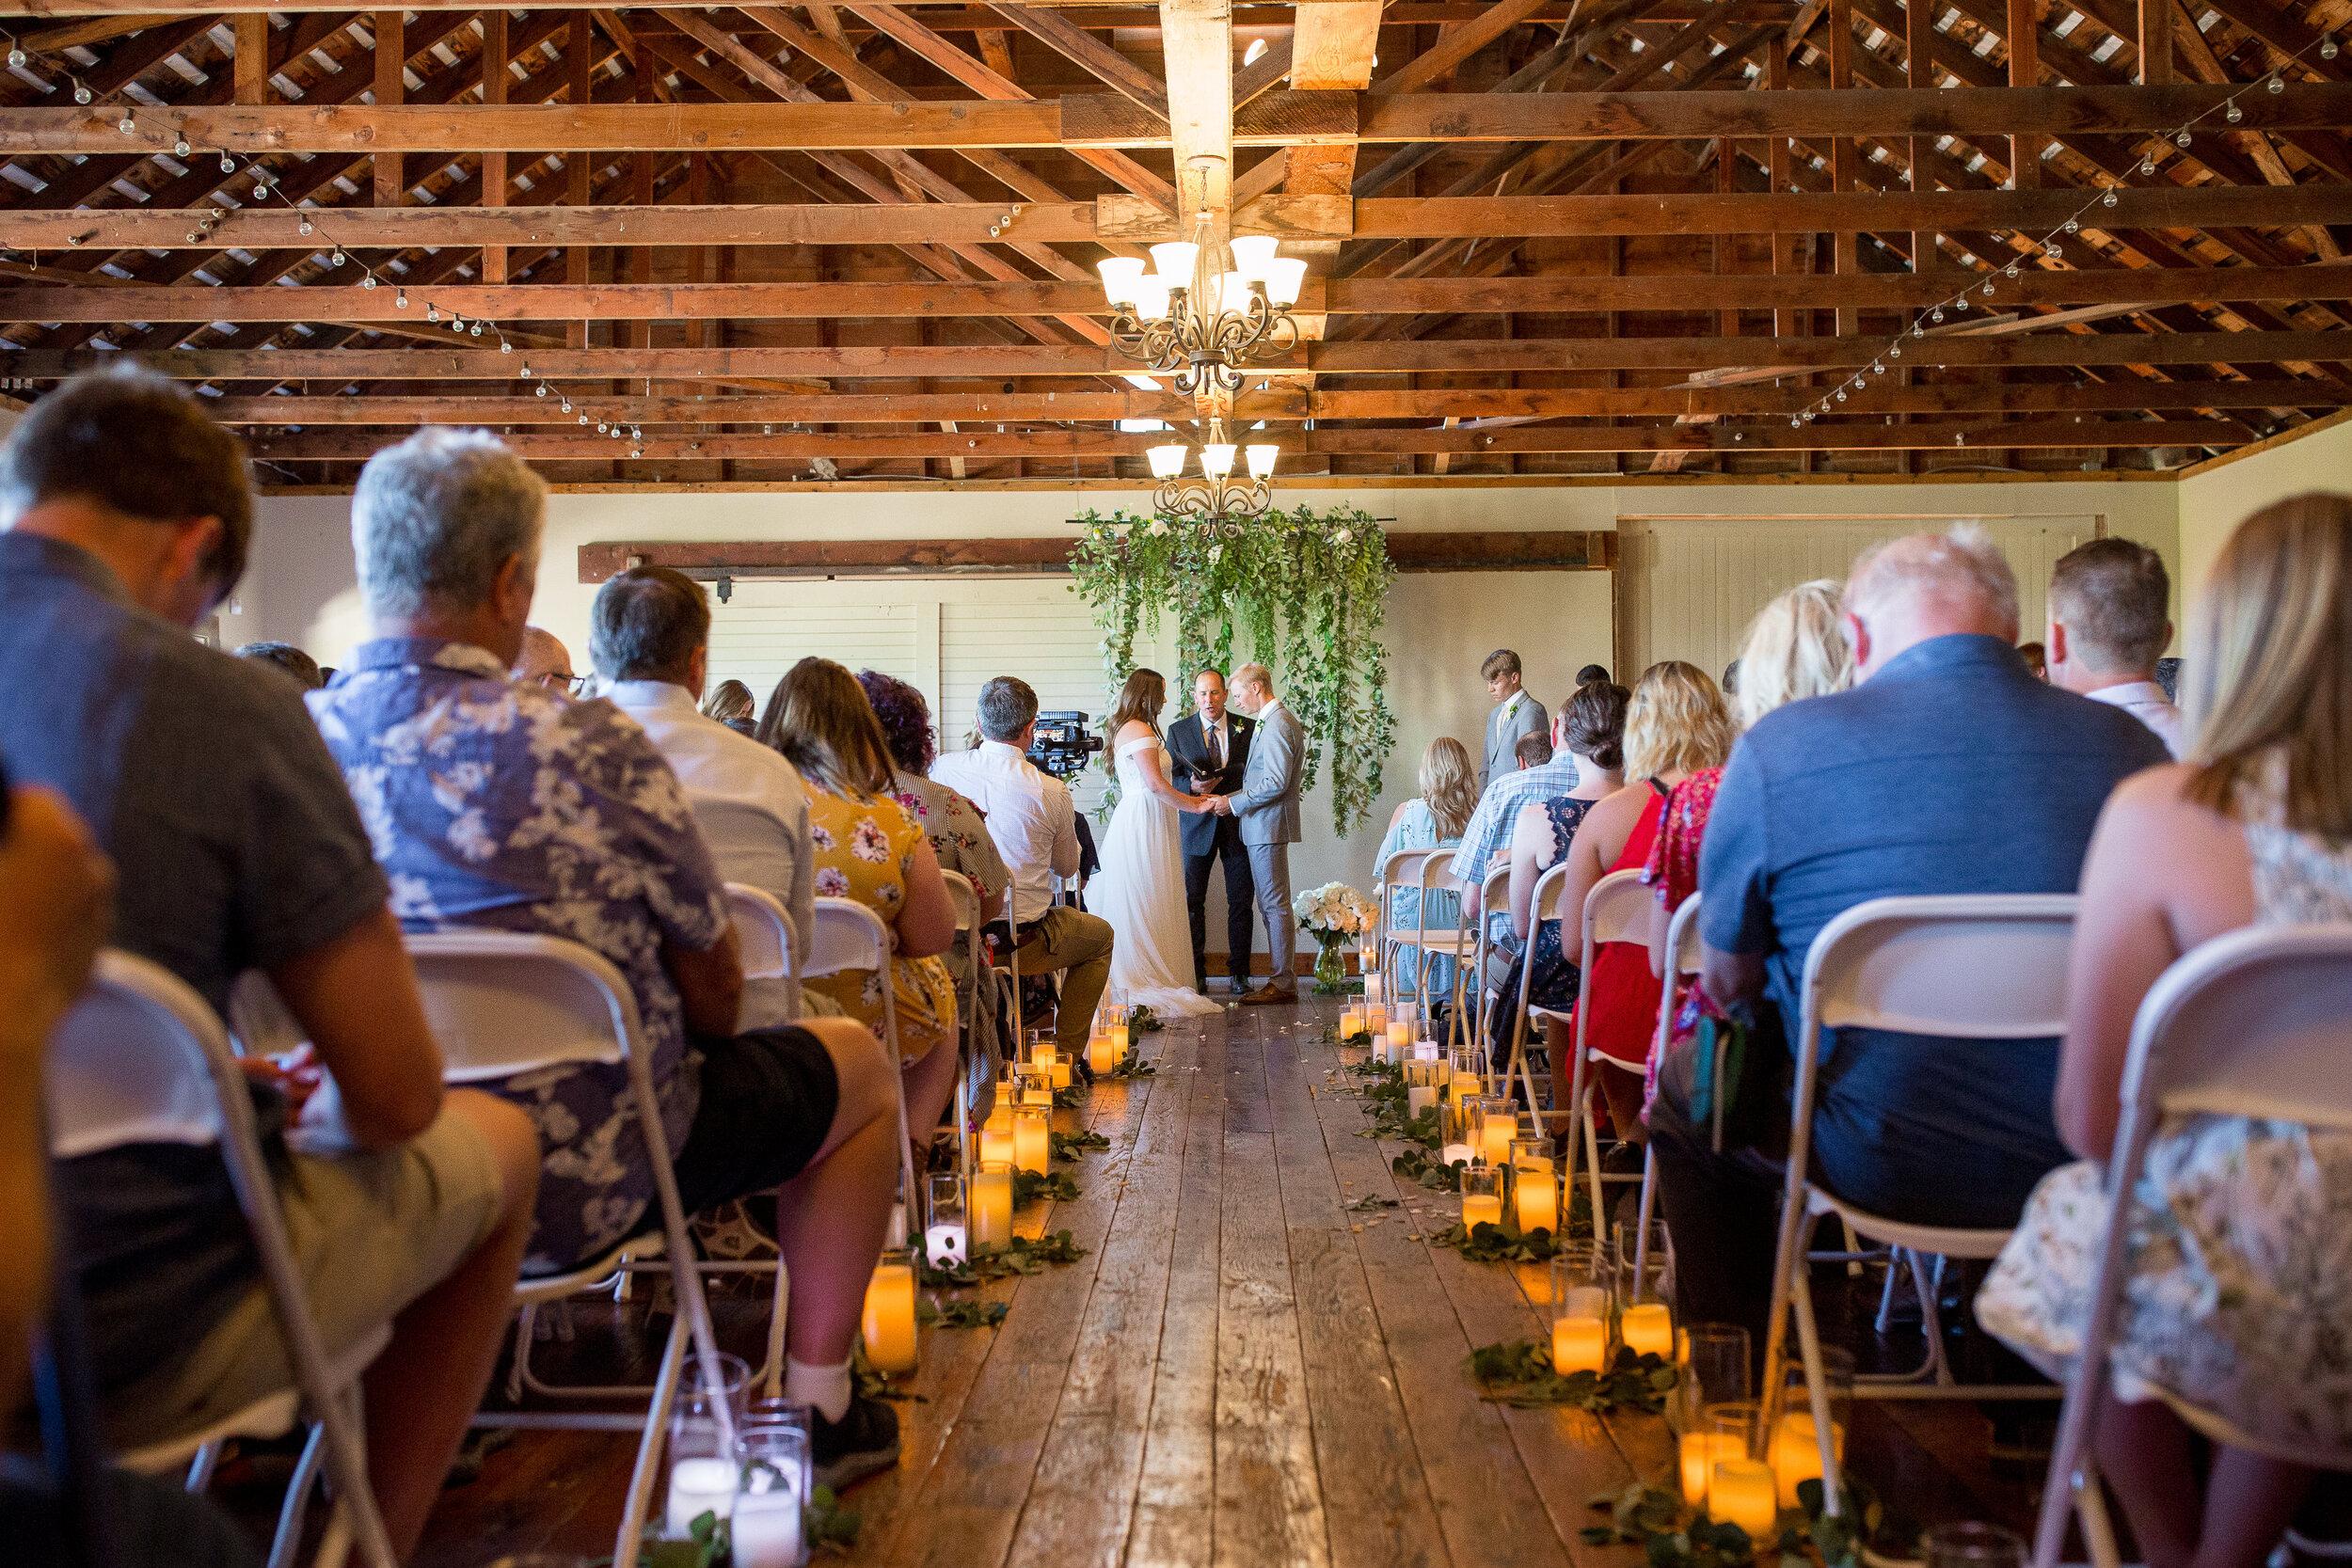 ceremony spokane wedding bride and groom